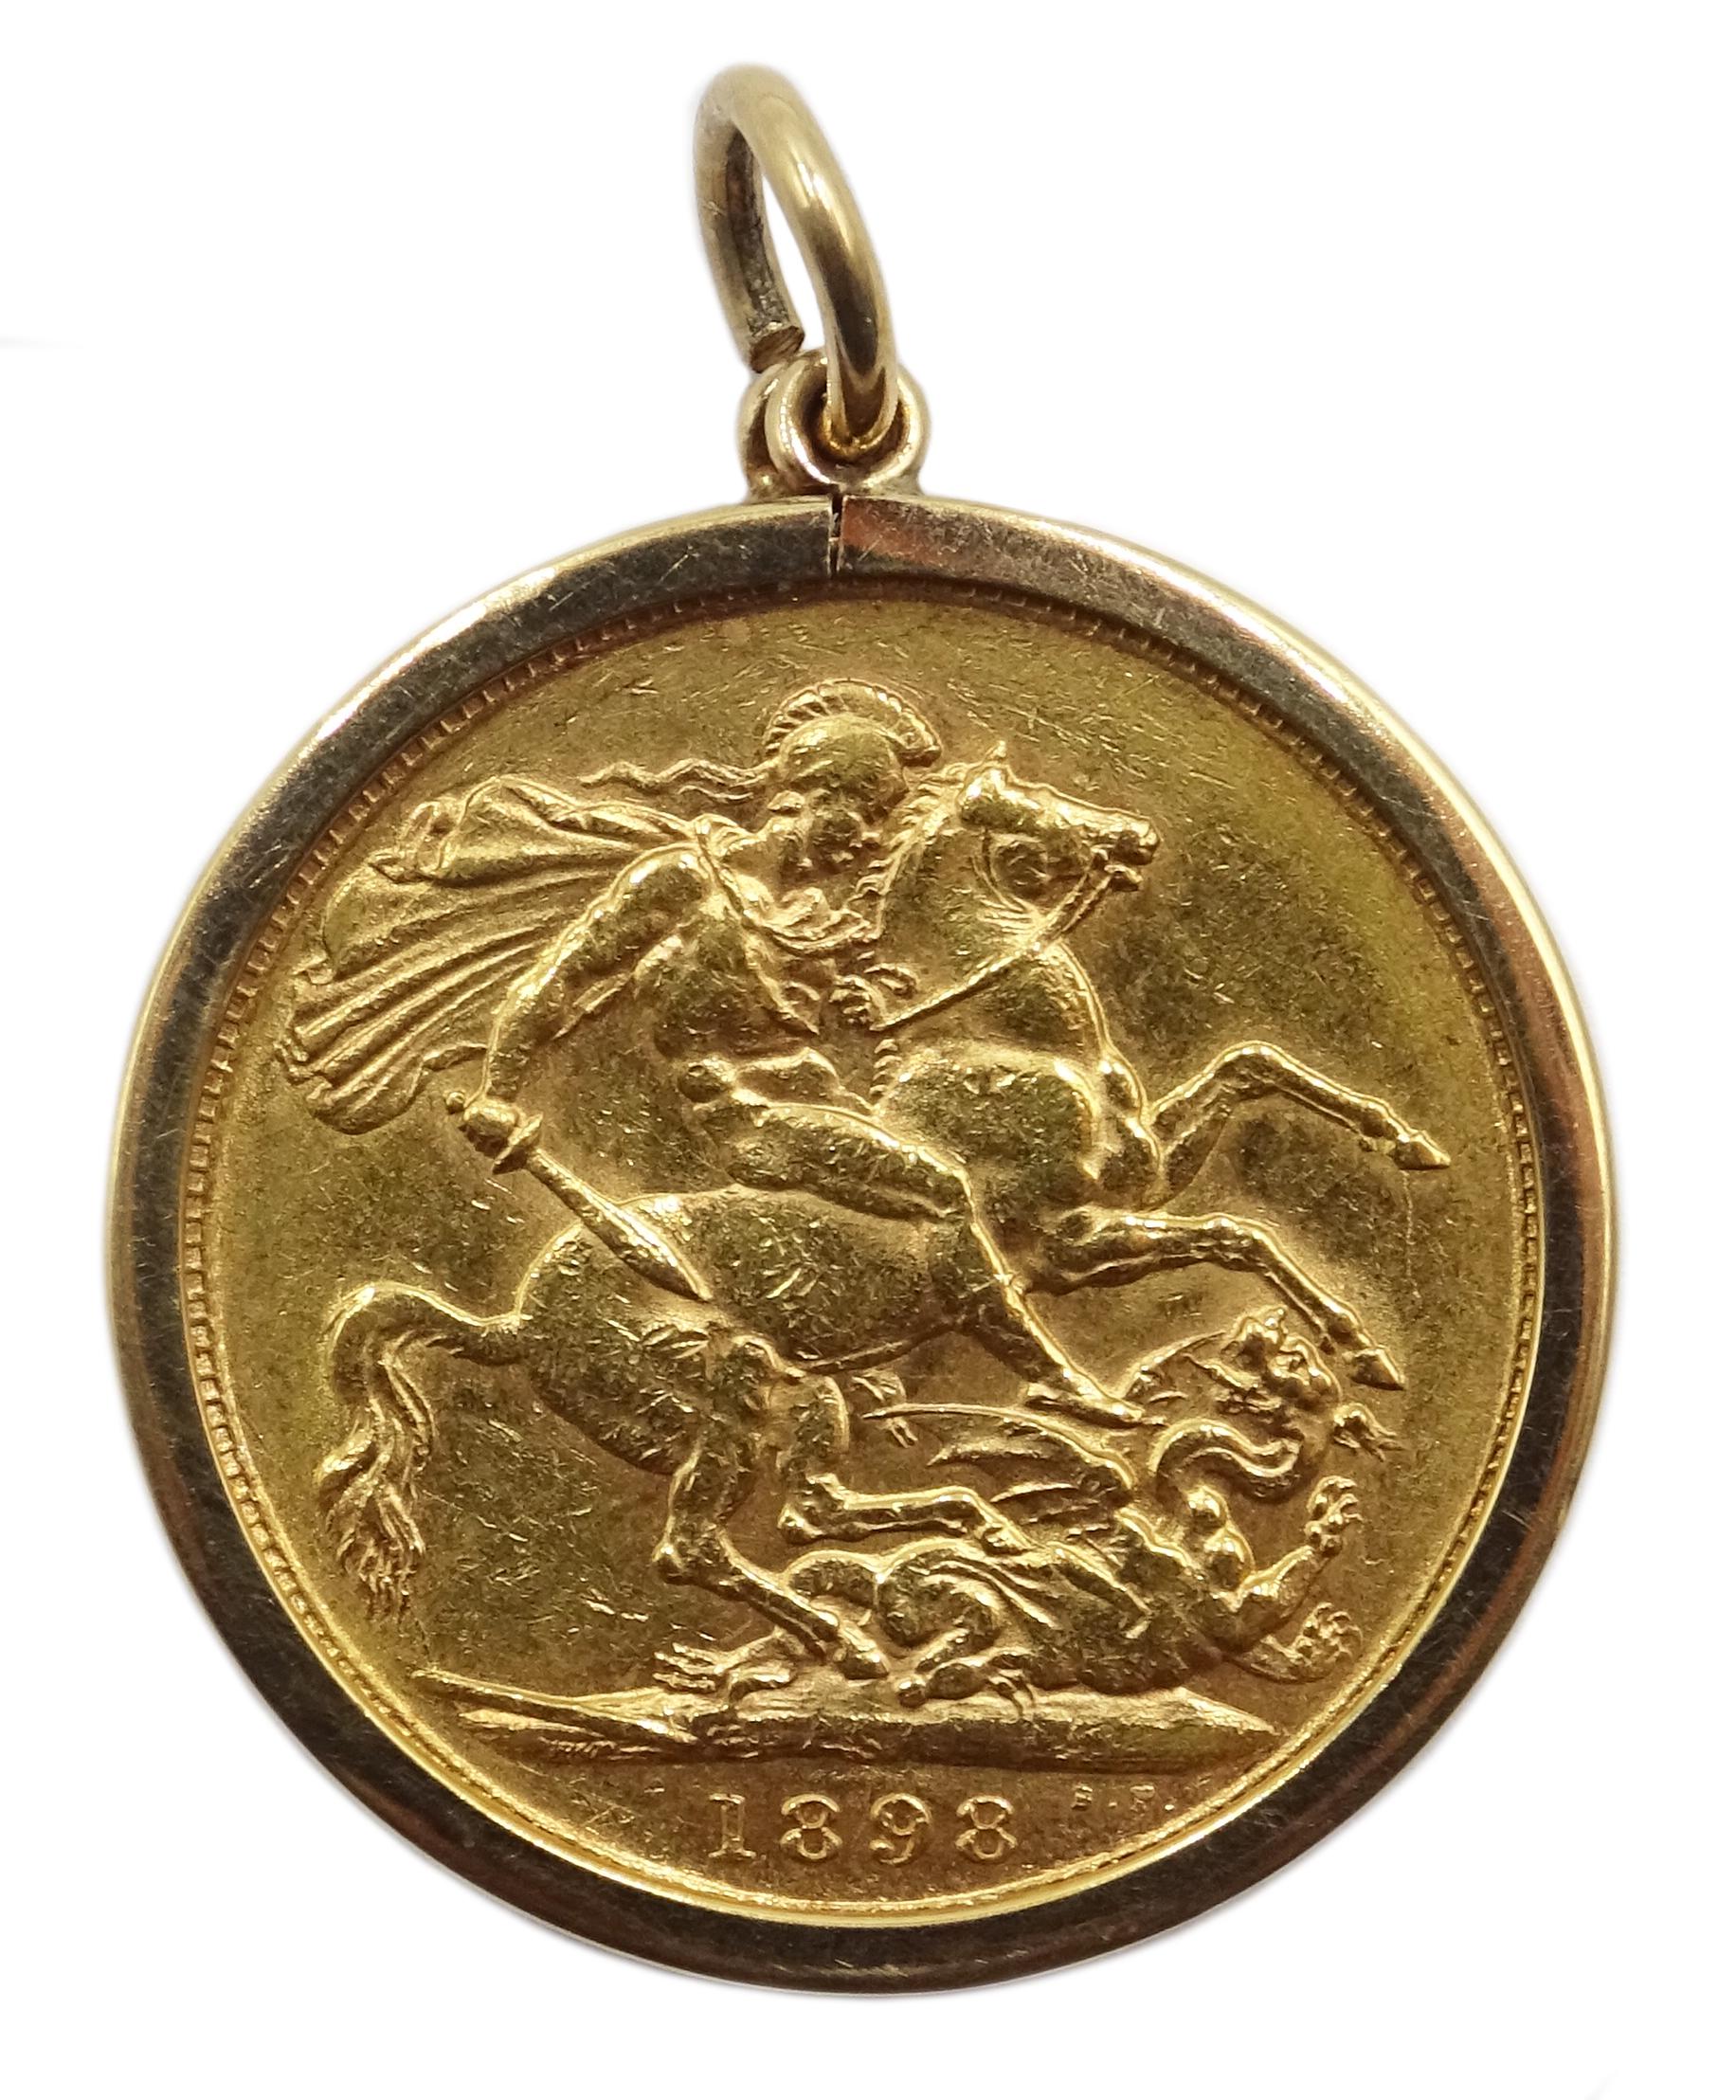 Lot 1036 - 1898 gold full sovereign Sydney mint mark,